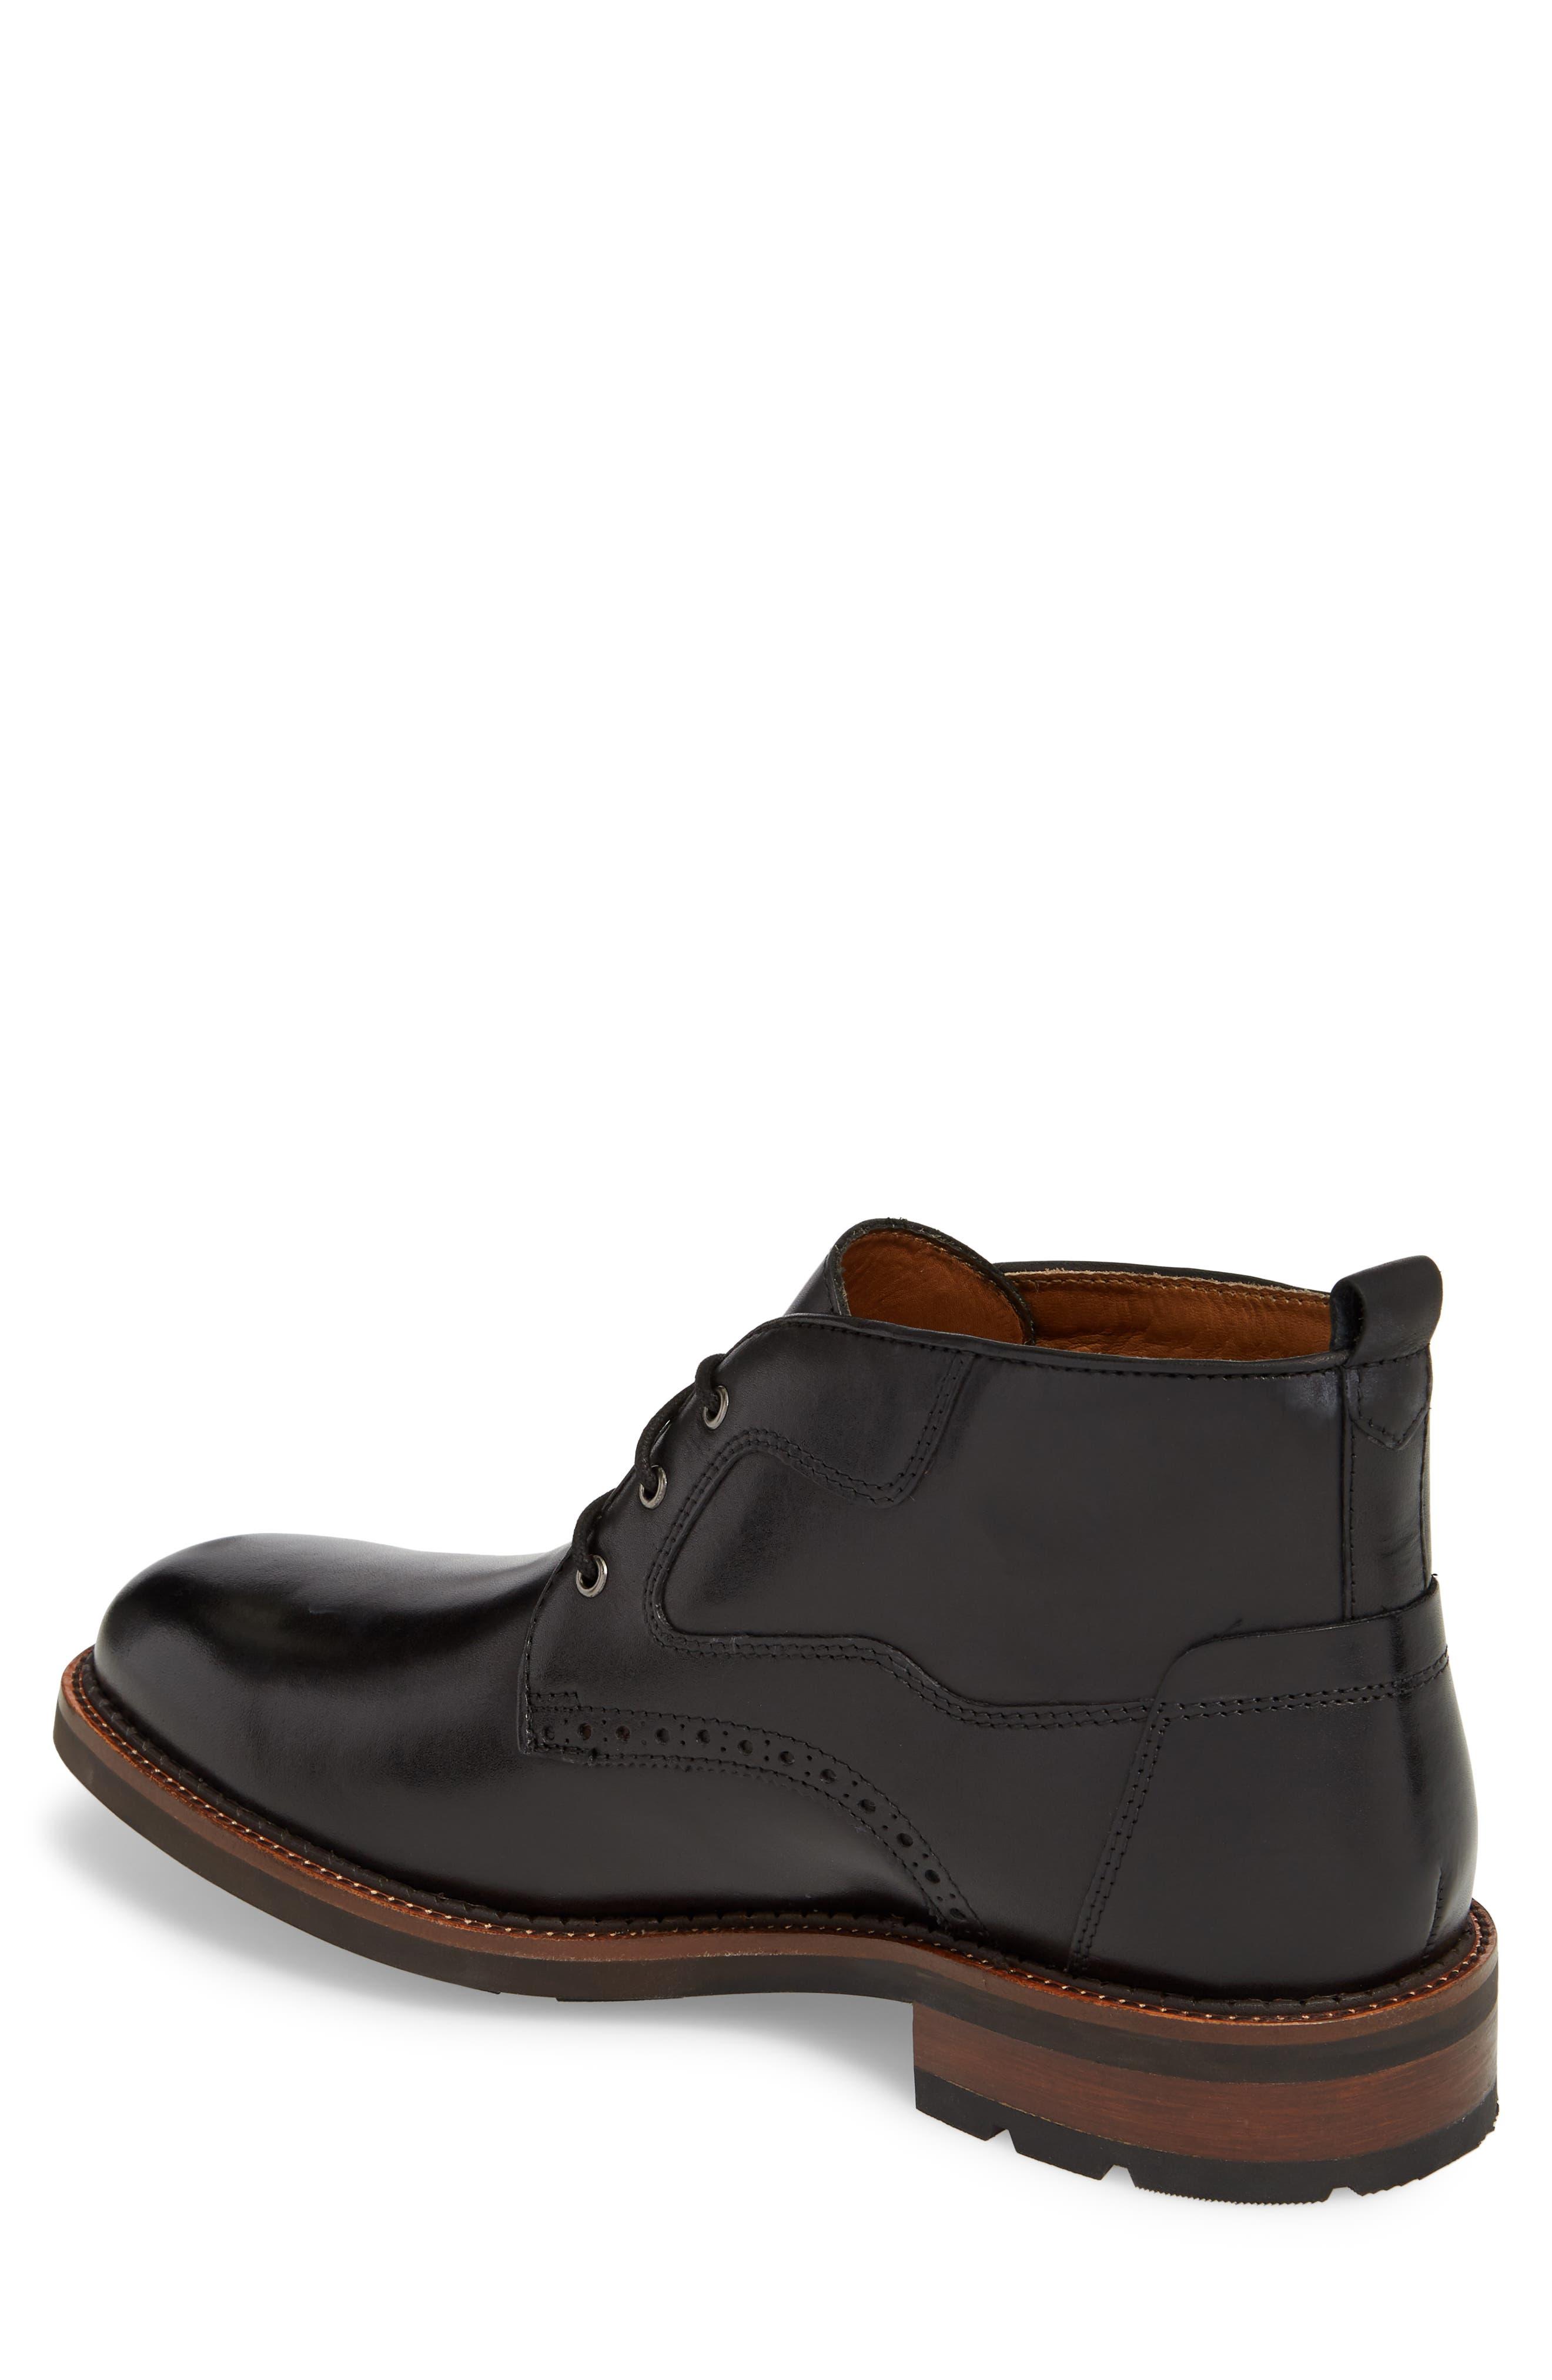 Fullerton Chukka Boot,                             Alternate thumbnail 2, color,                             BLACK